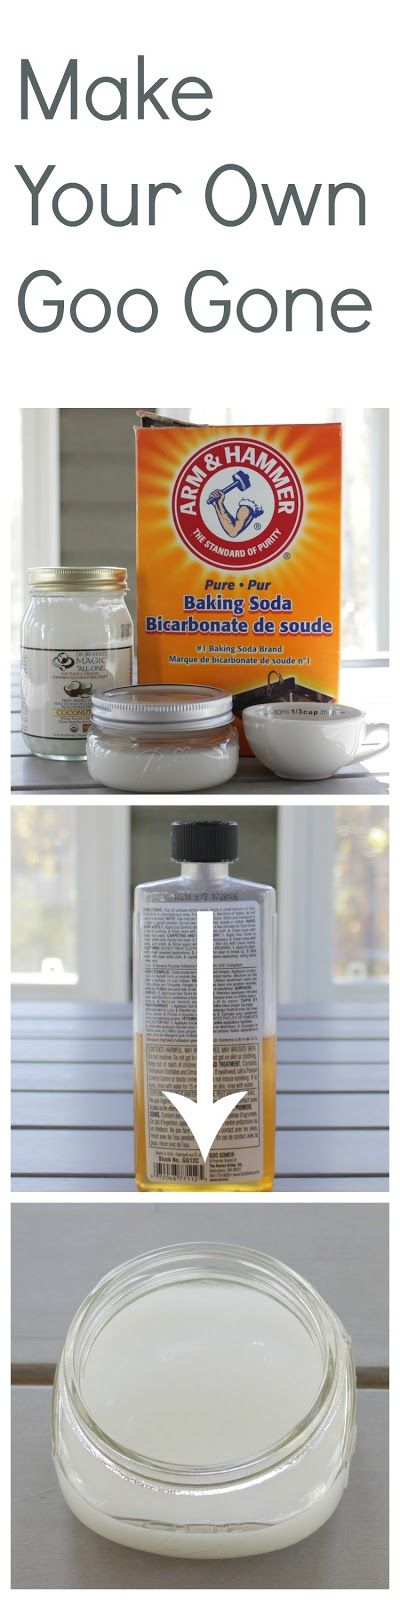 Simple is Pretty Homemade Goo Gone Wonderful Baking Soda - truc et astuce maison bricolage